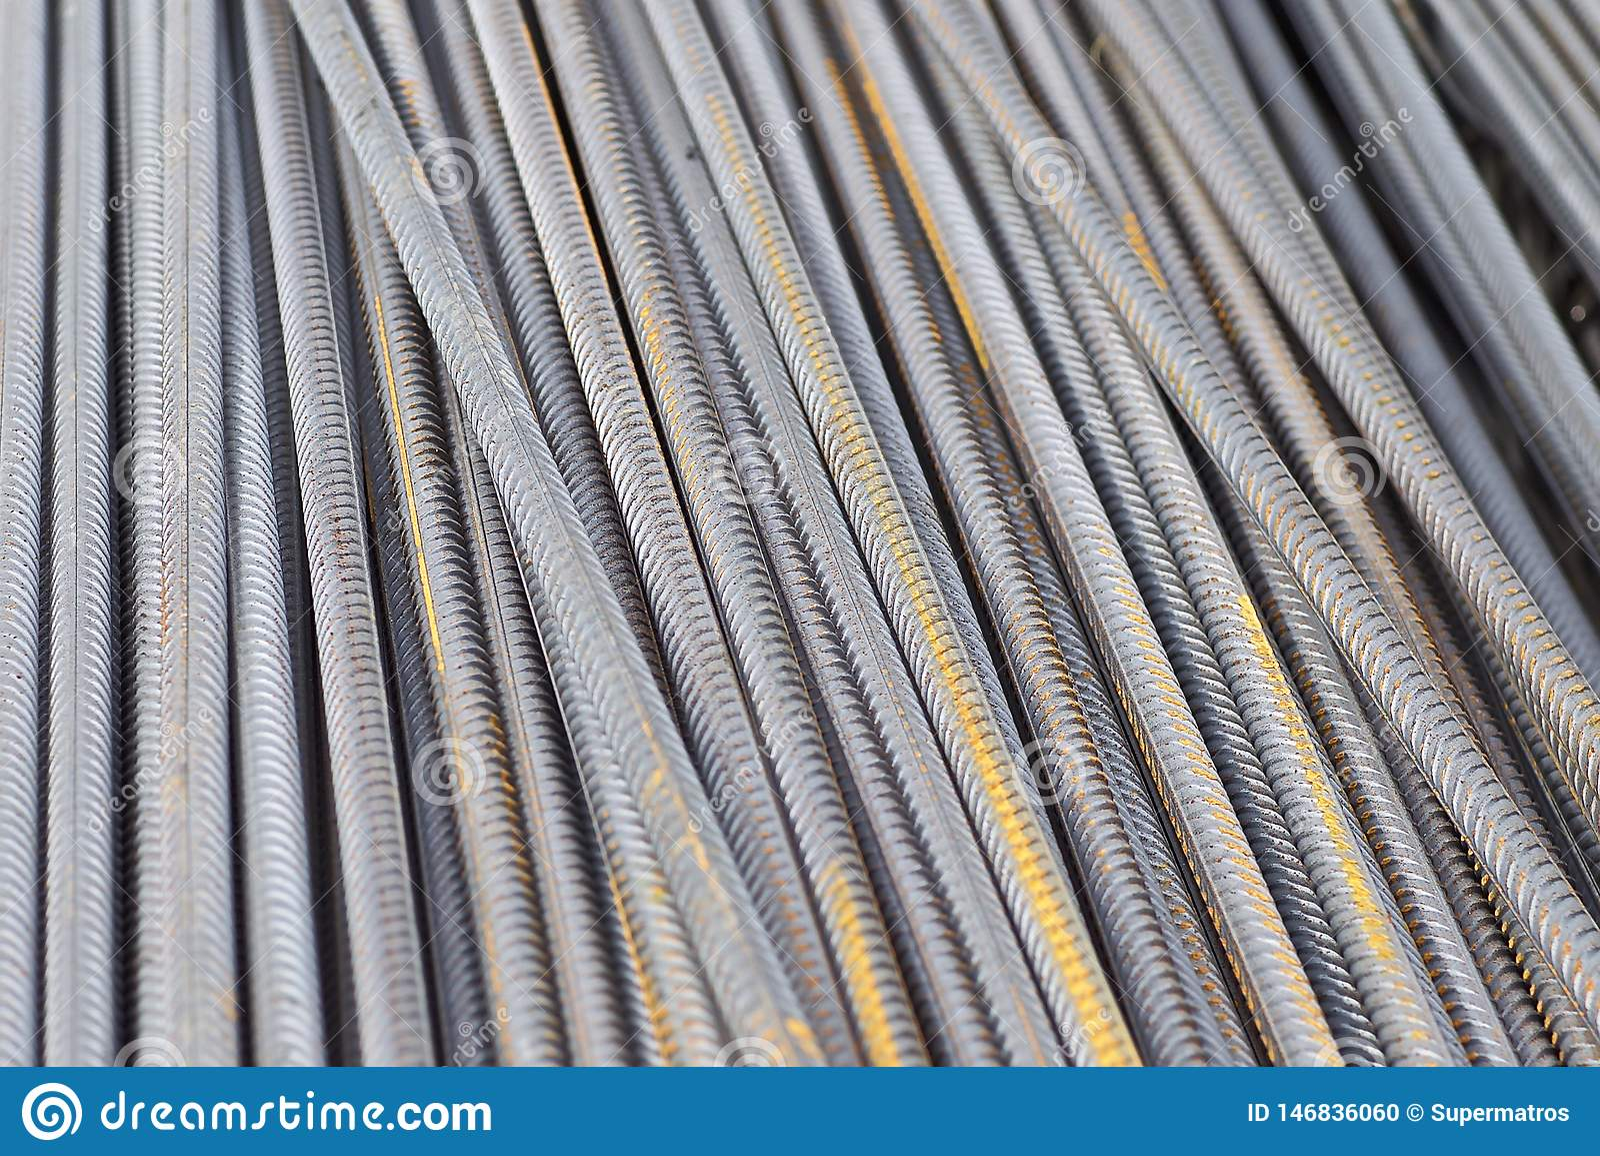 F?rst?rkningsst?nger med en periodisk profil i packarna lagras i lagret f?r metallprodukter